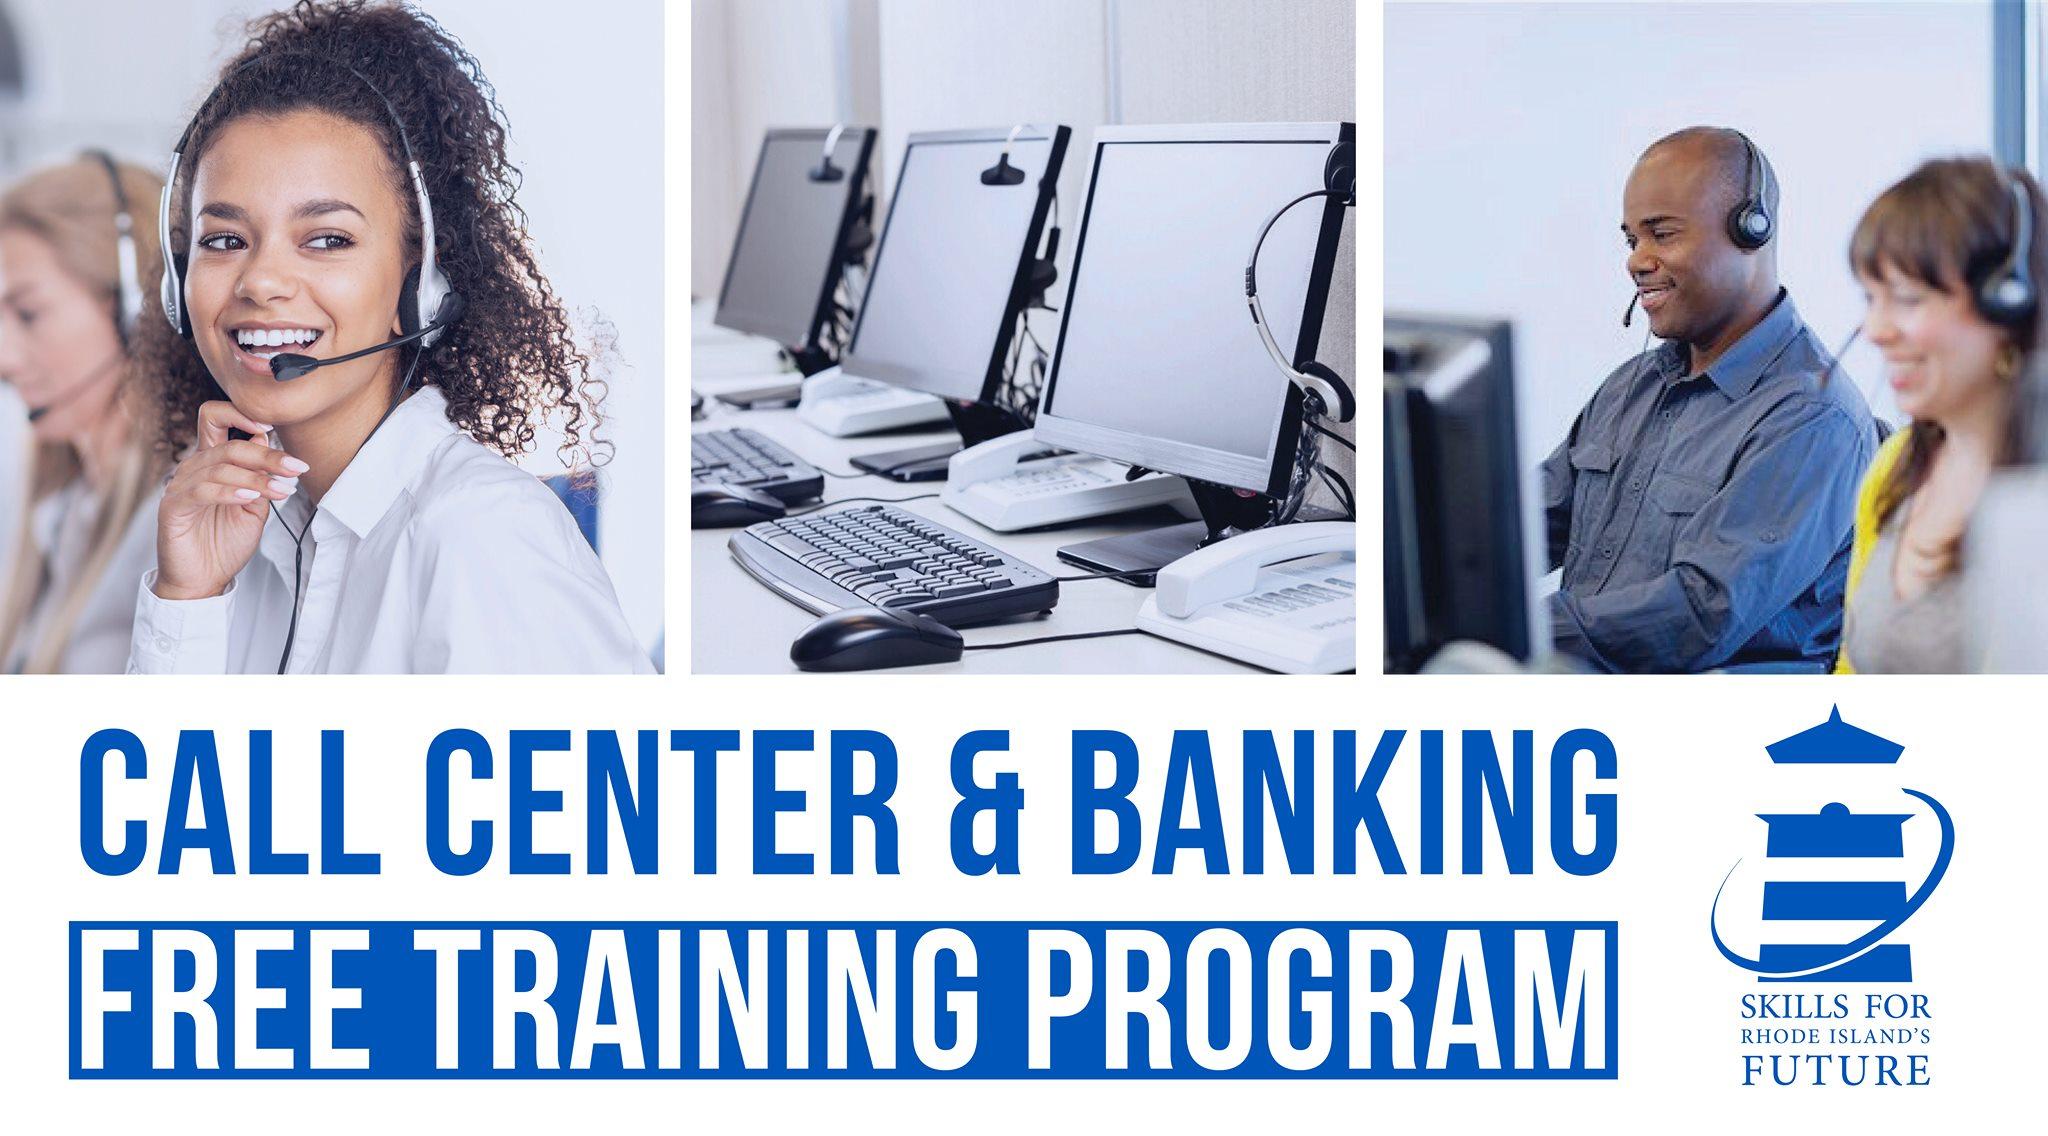 Call Center Job Training in Rhode Island